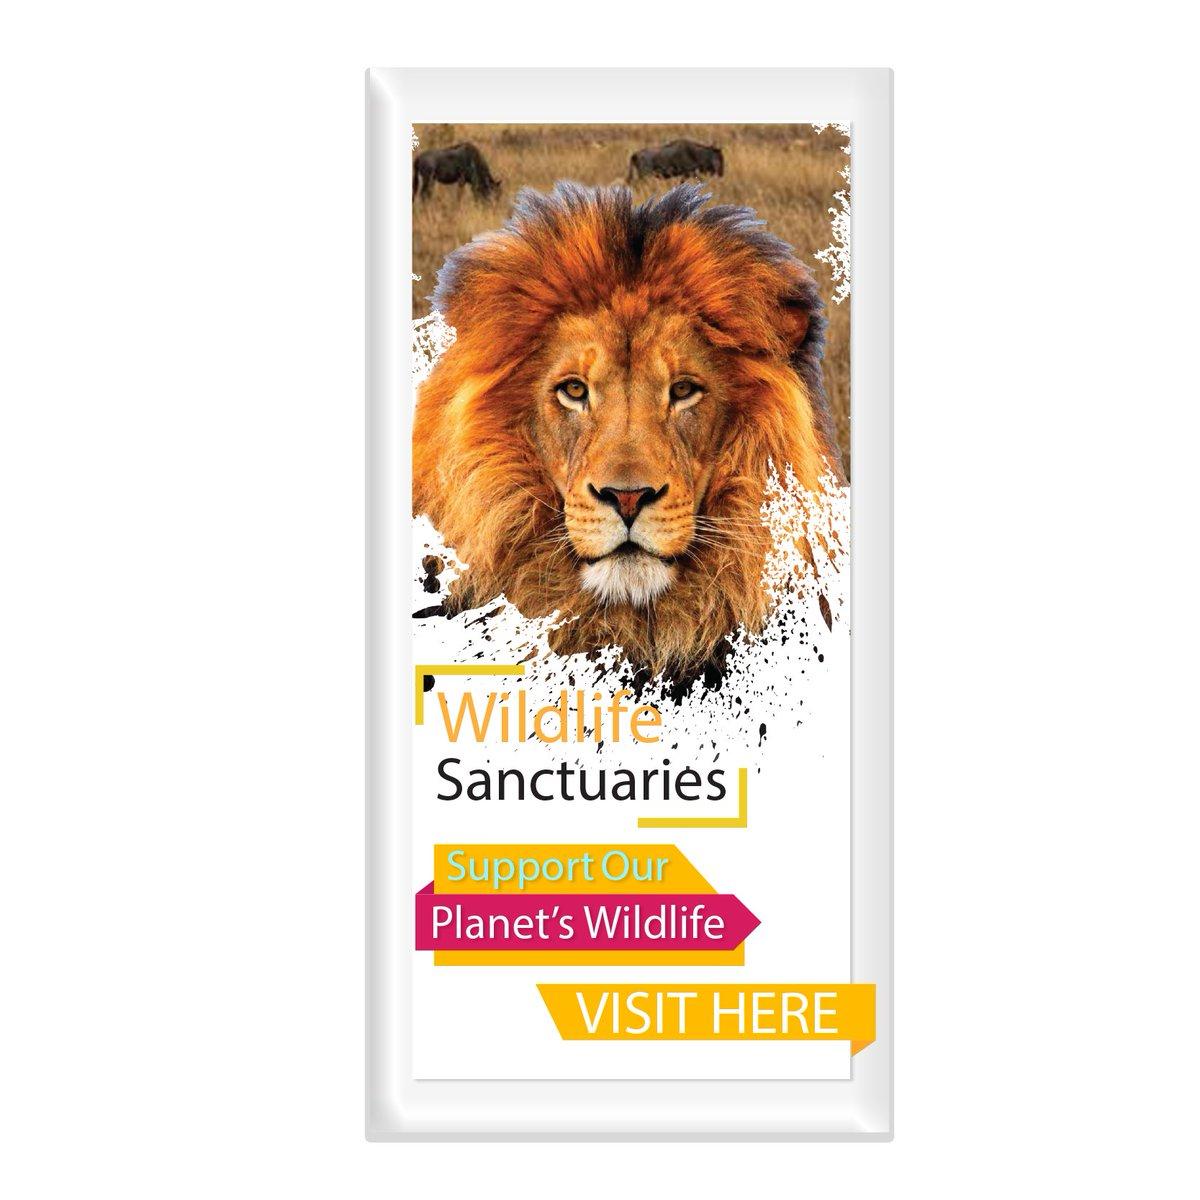 Adopt or support Endangered Wildlife  -#wildlifetour #endangered #StopExtinction #reptiles #environment https://t.co/UC8yD5SDER https://t.co/x46BN0MAfr